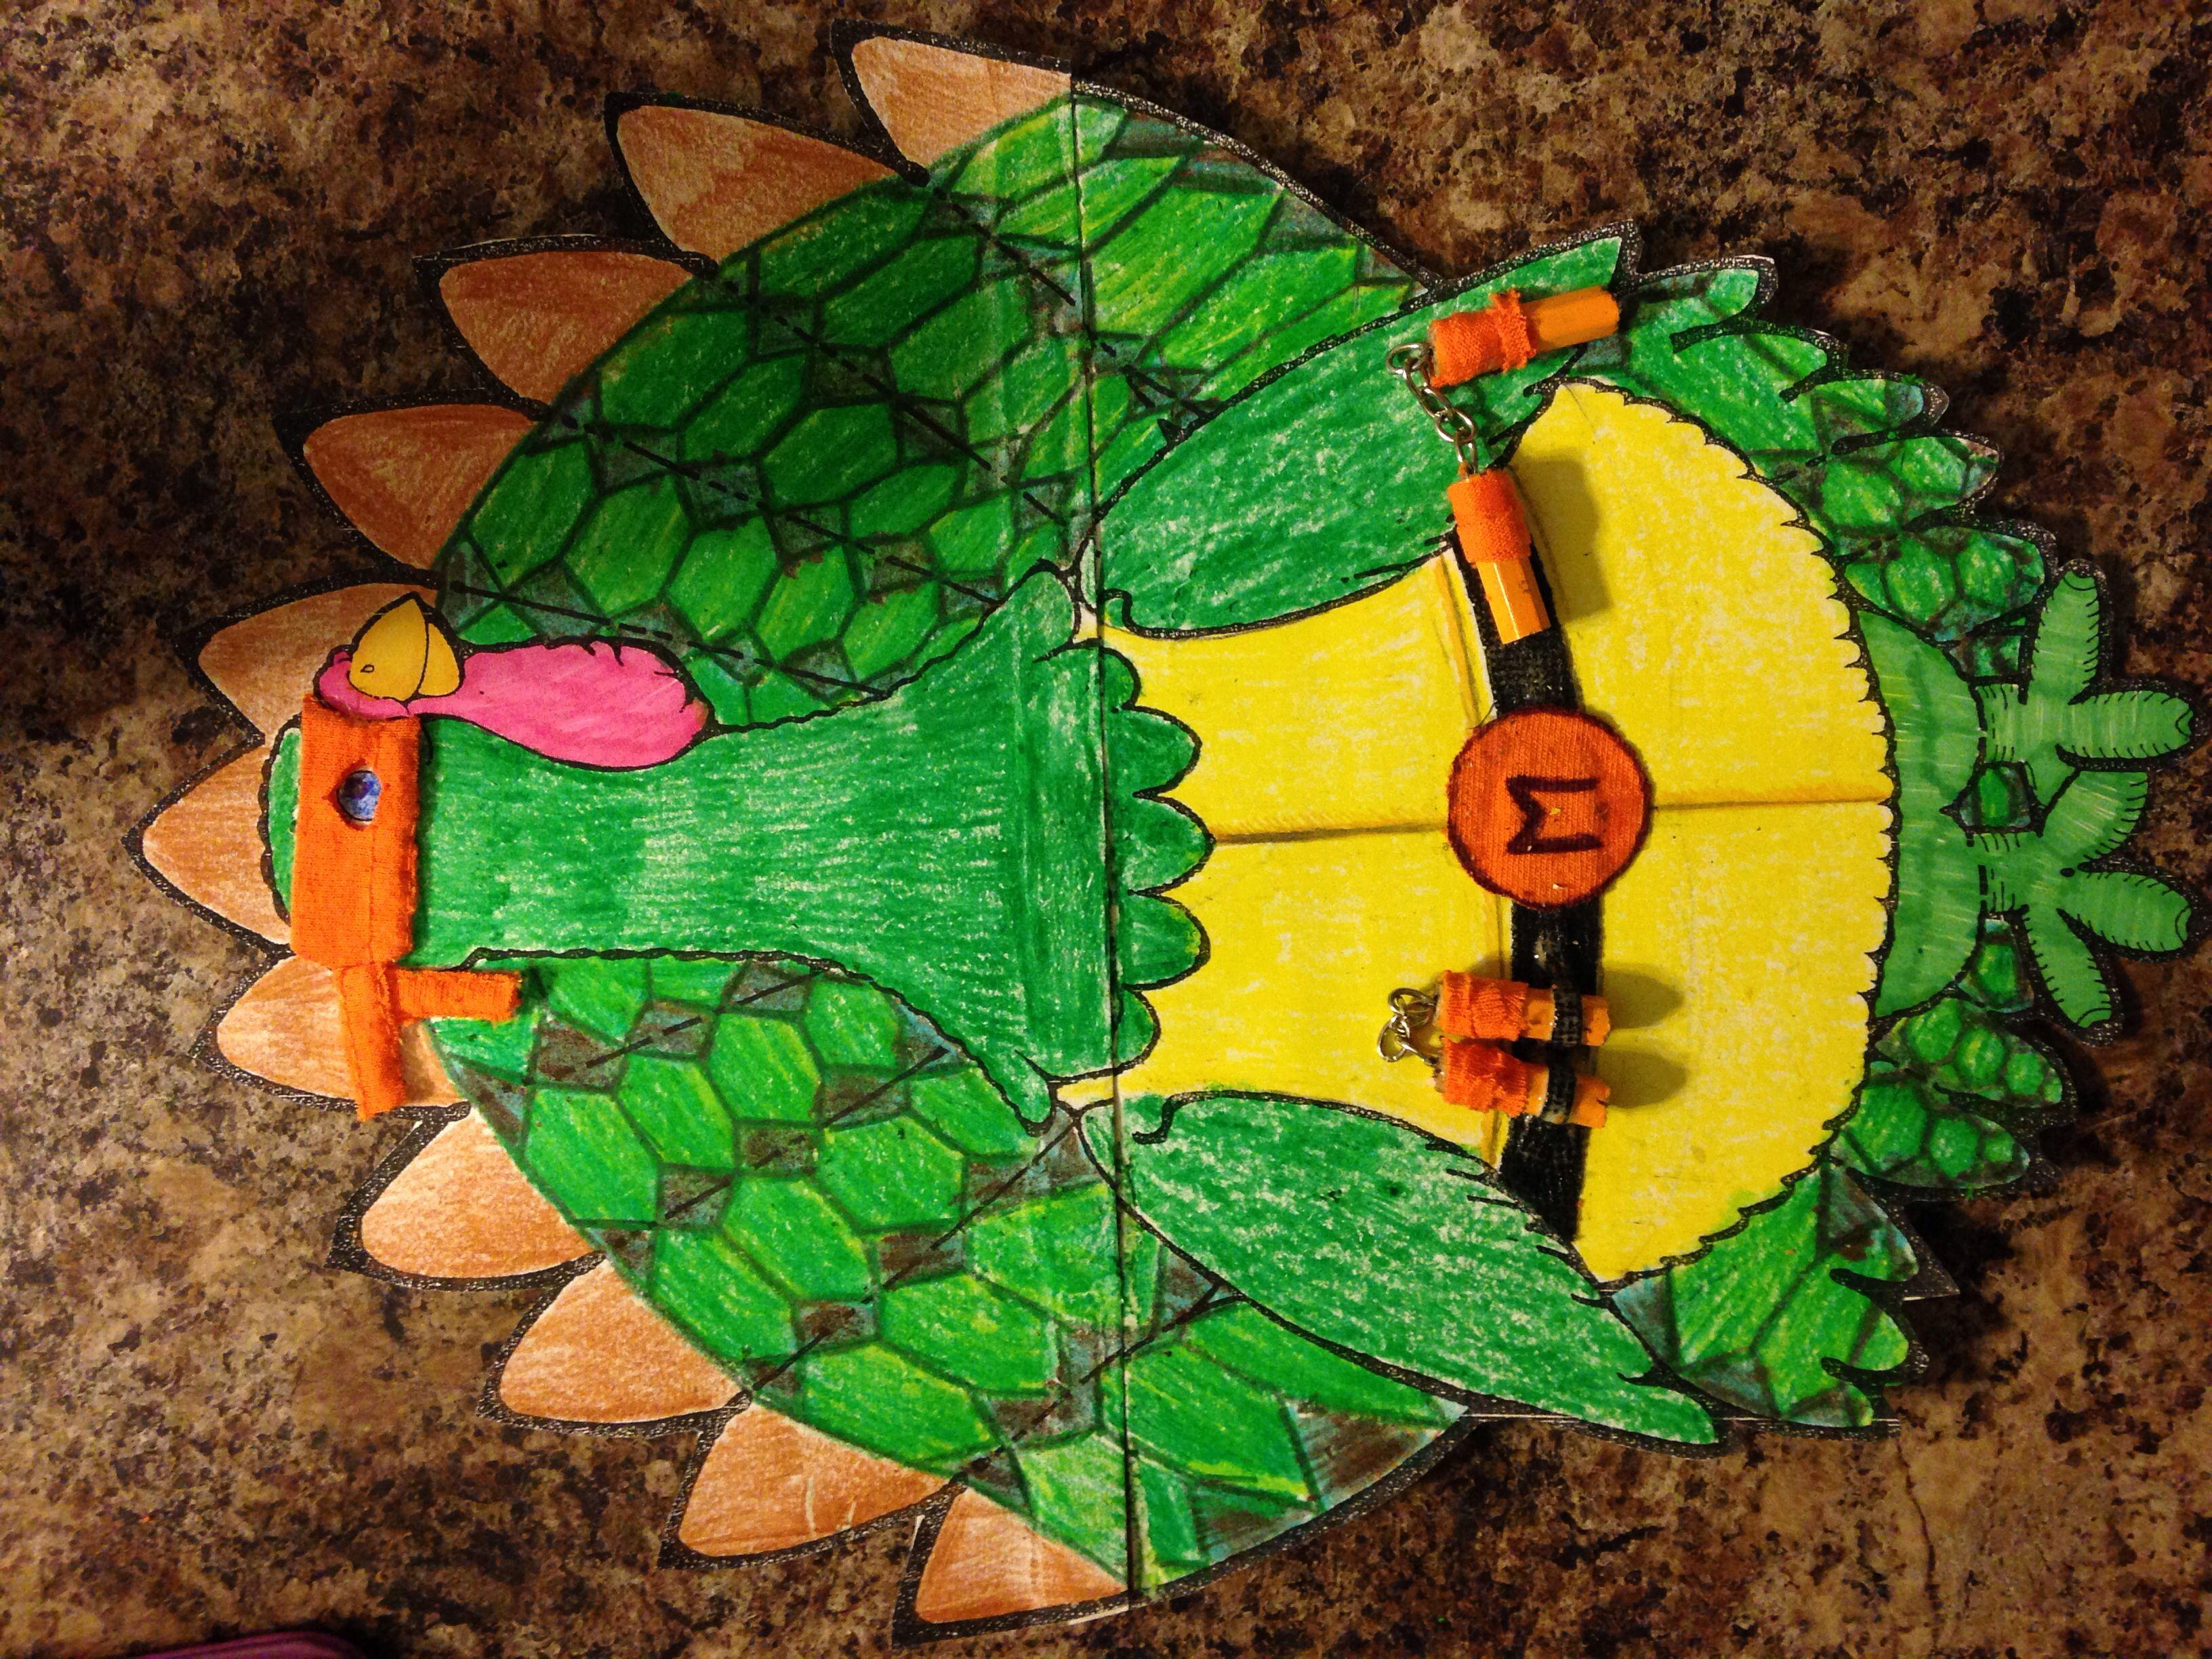 Disguise a turkey idea #disguiseaturkeyideas